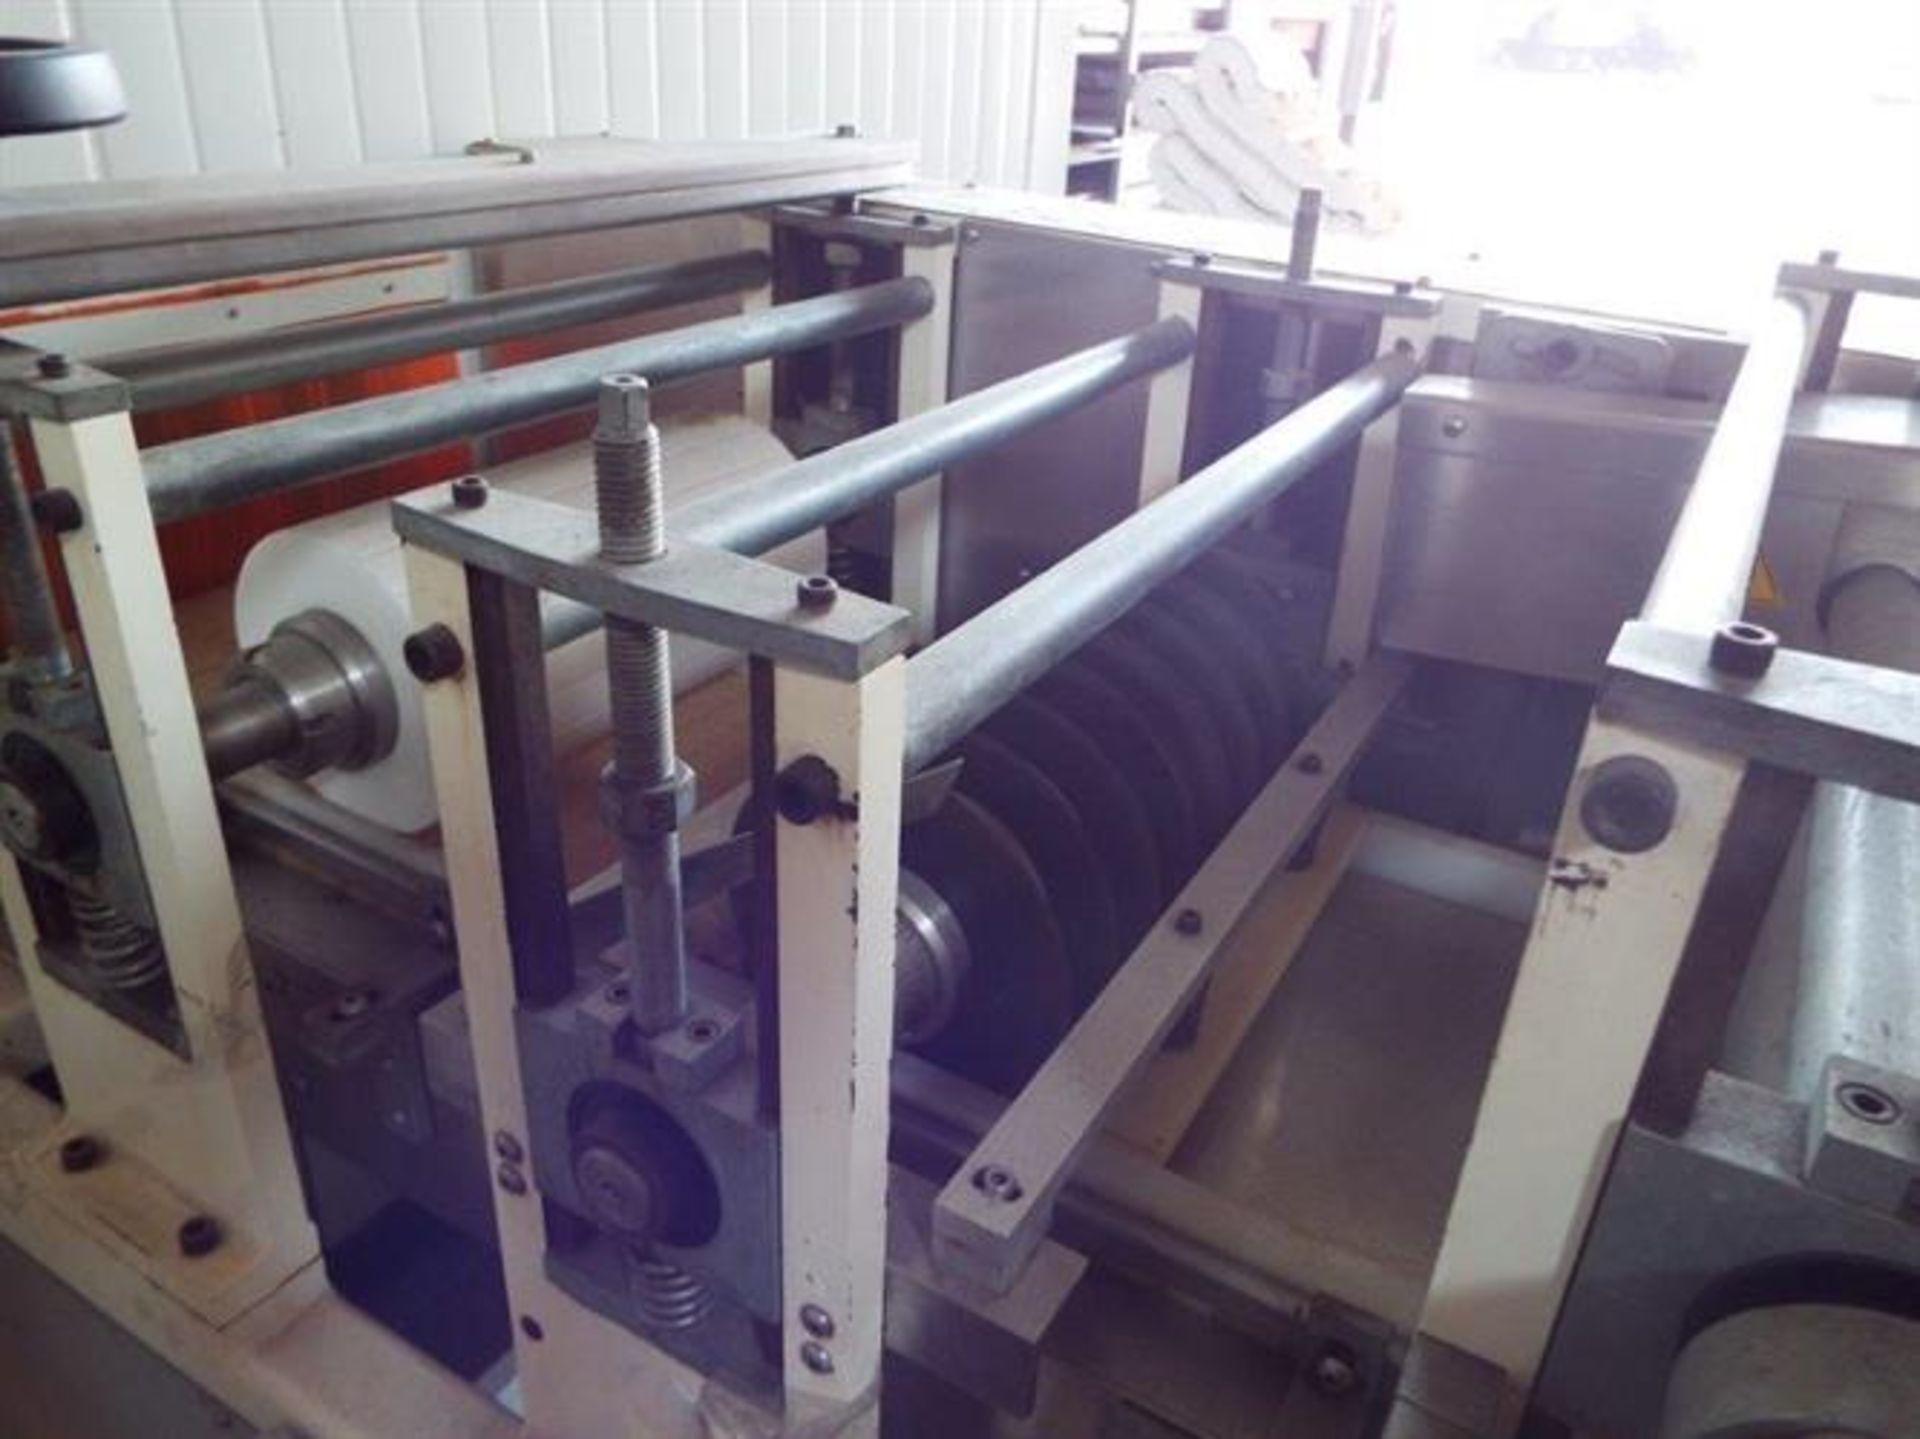 Tecmaq 290 mm Wide Slab Forming Line - Model TM-6H built 2012 - Three sets of gauging/sheeting - Image 17 of 30